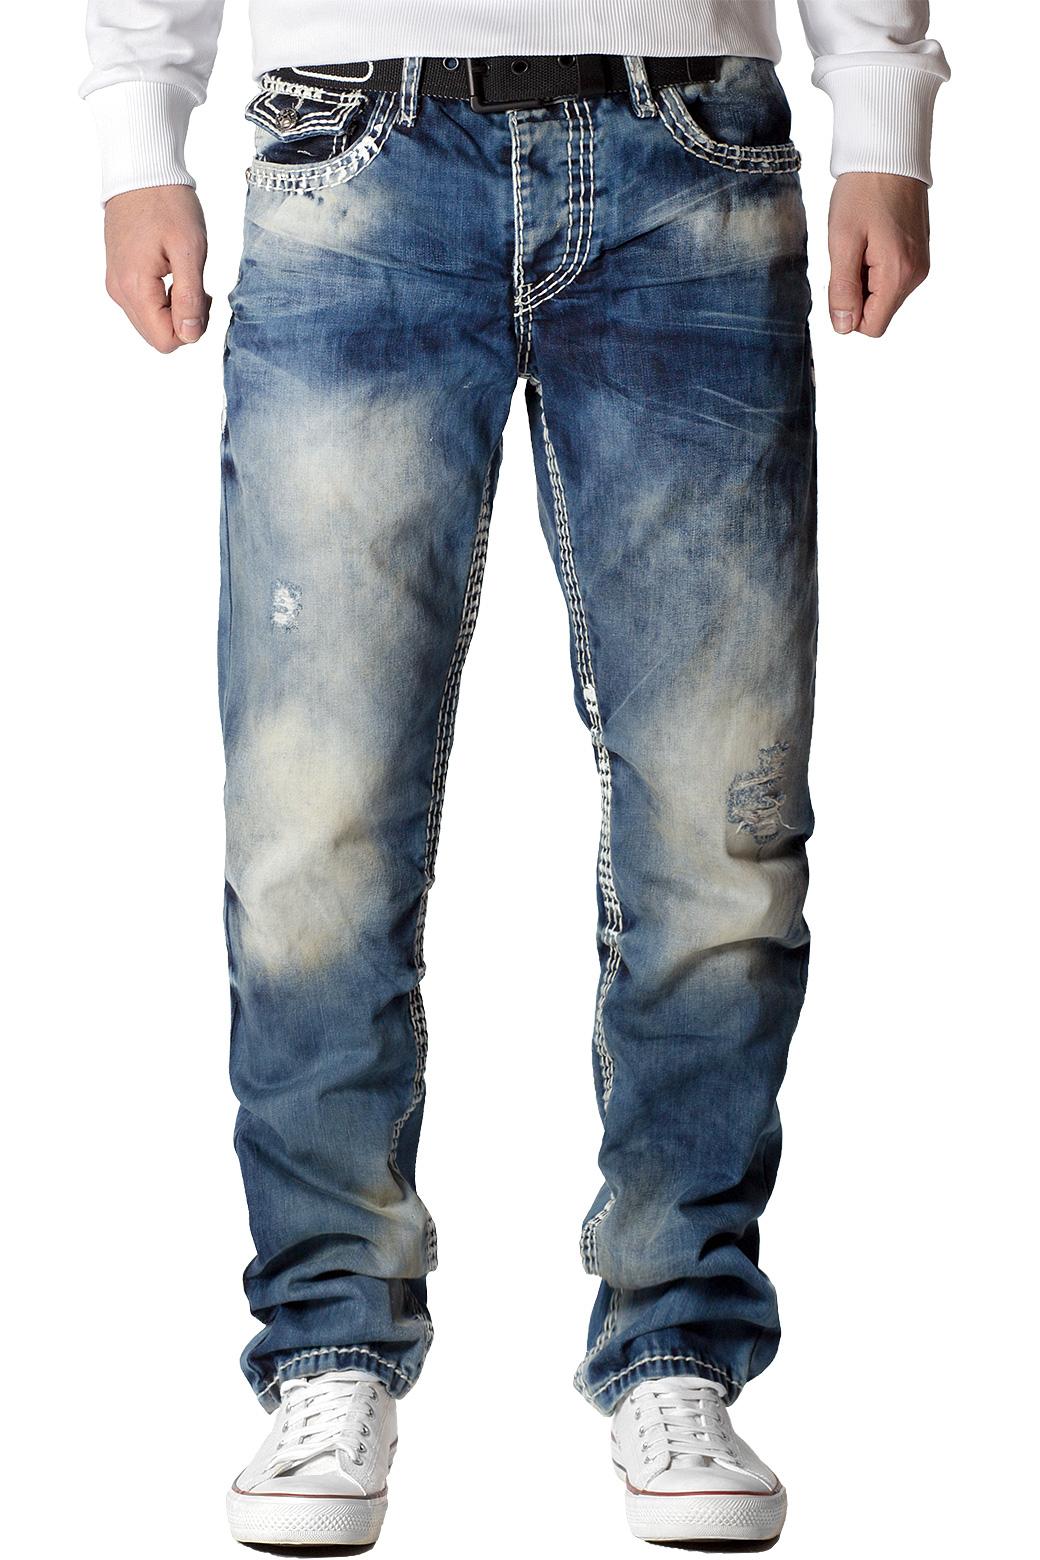 Cipo-amp-Baxx-Uomo-Jeans-Pantaloni-ricamate-Biker-Style-streetwear-nervature-pattern-Dope miniatura 9